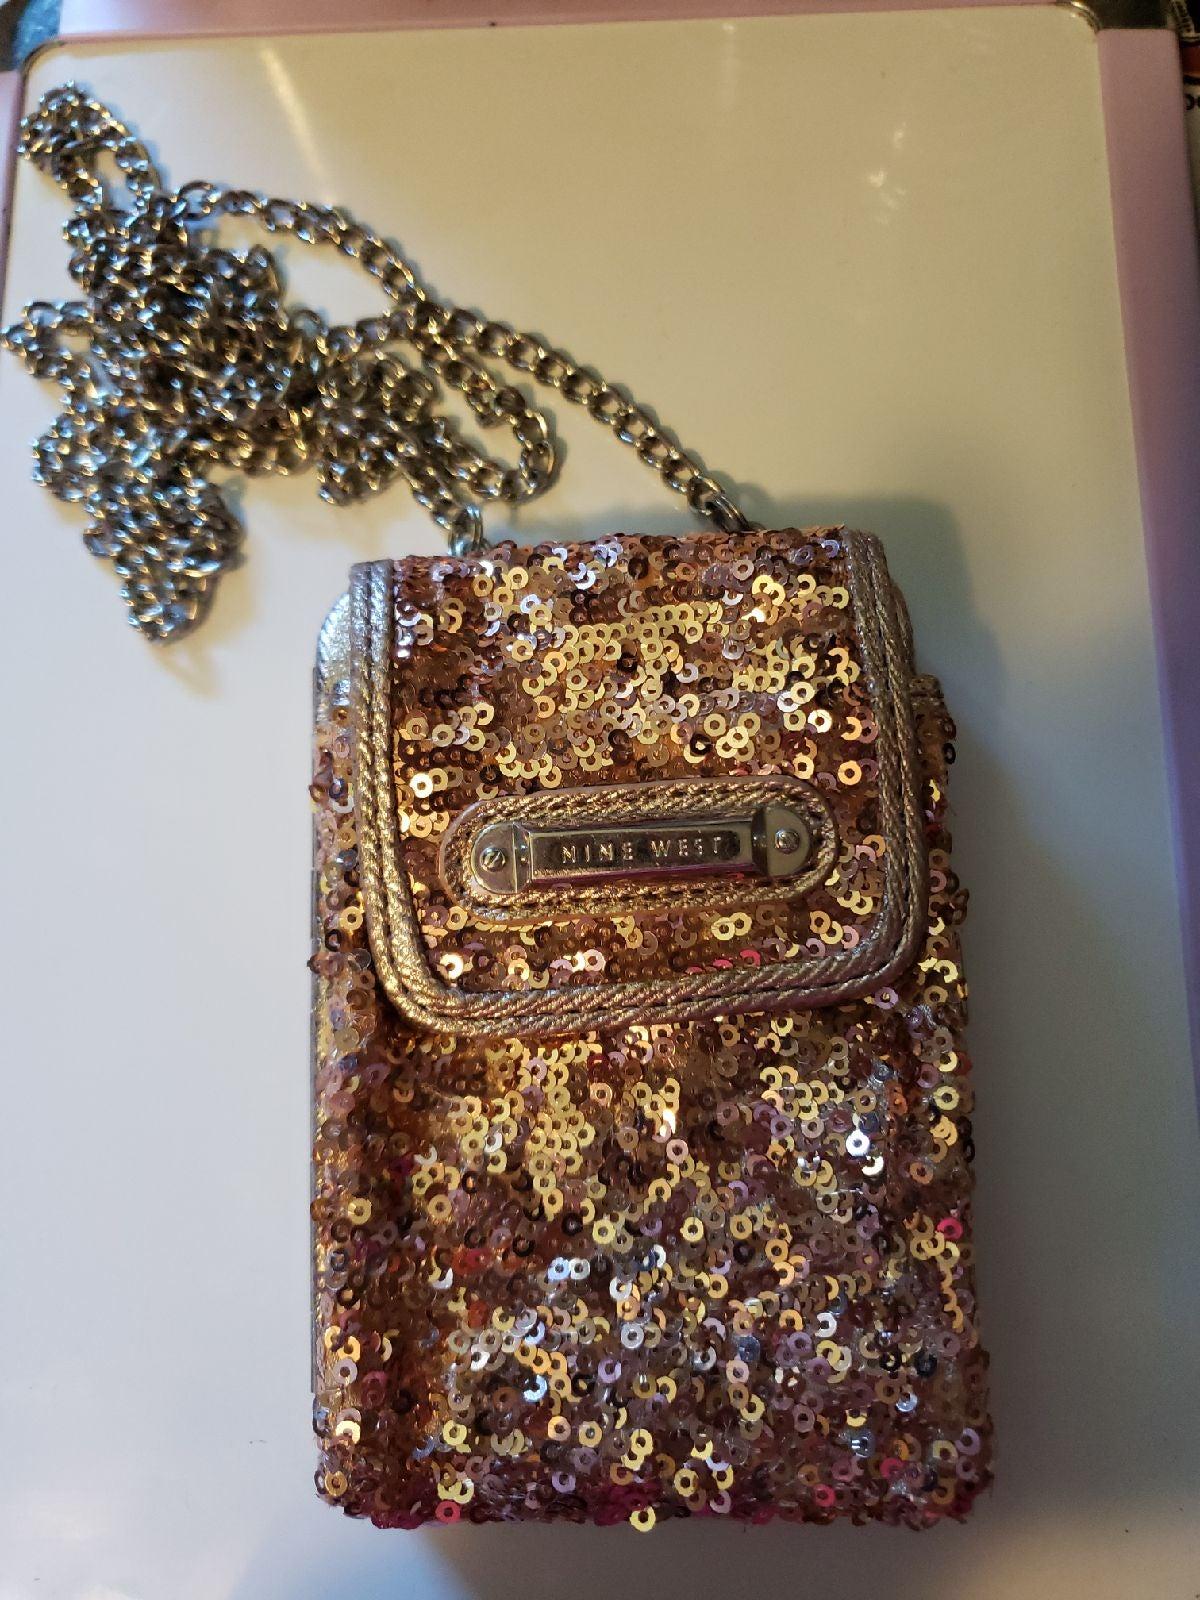 Nine West rose gold chain purse.